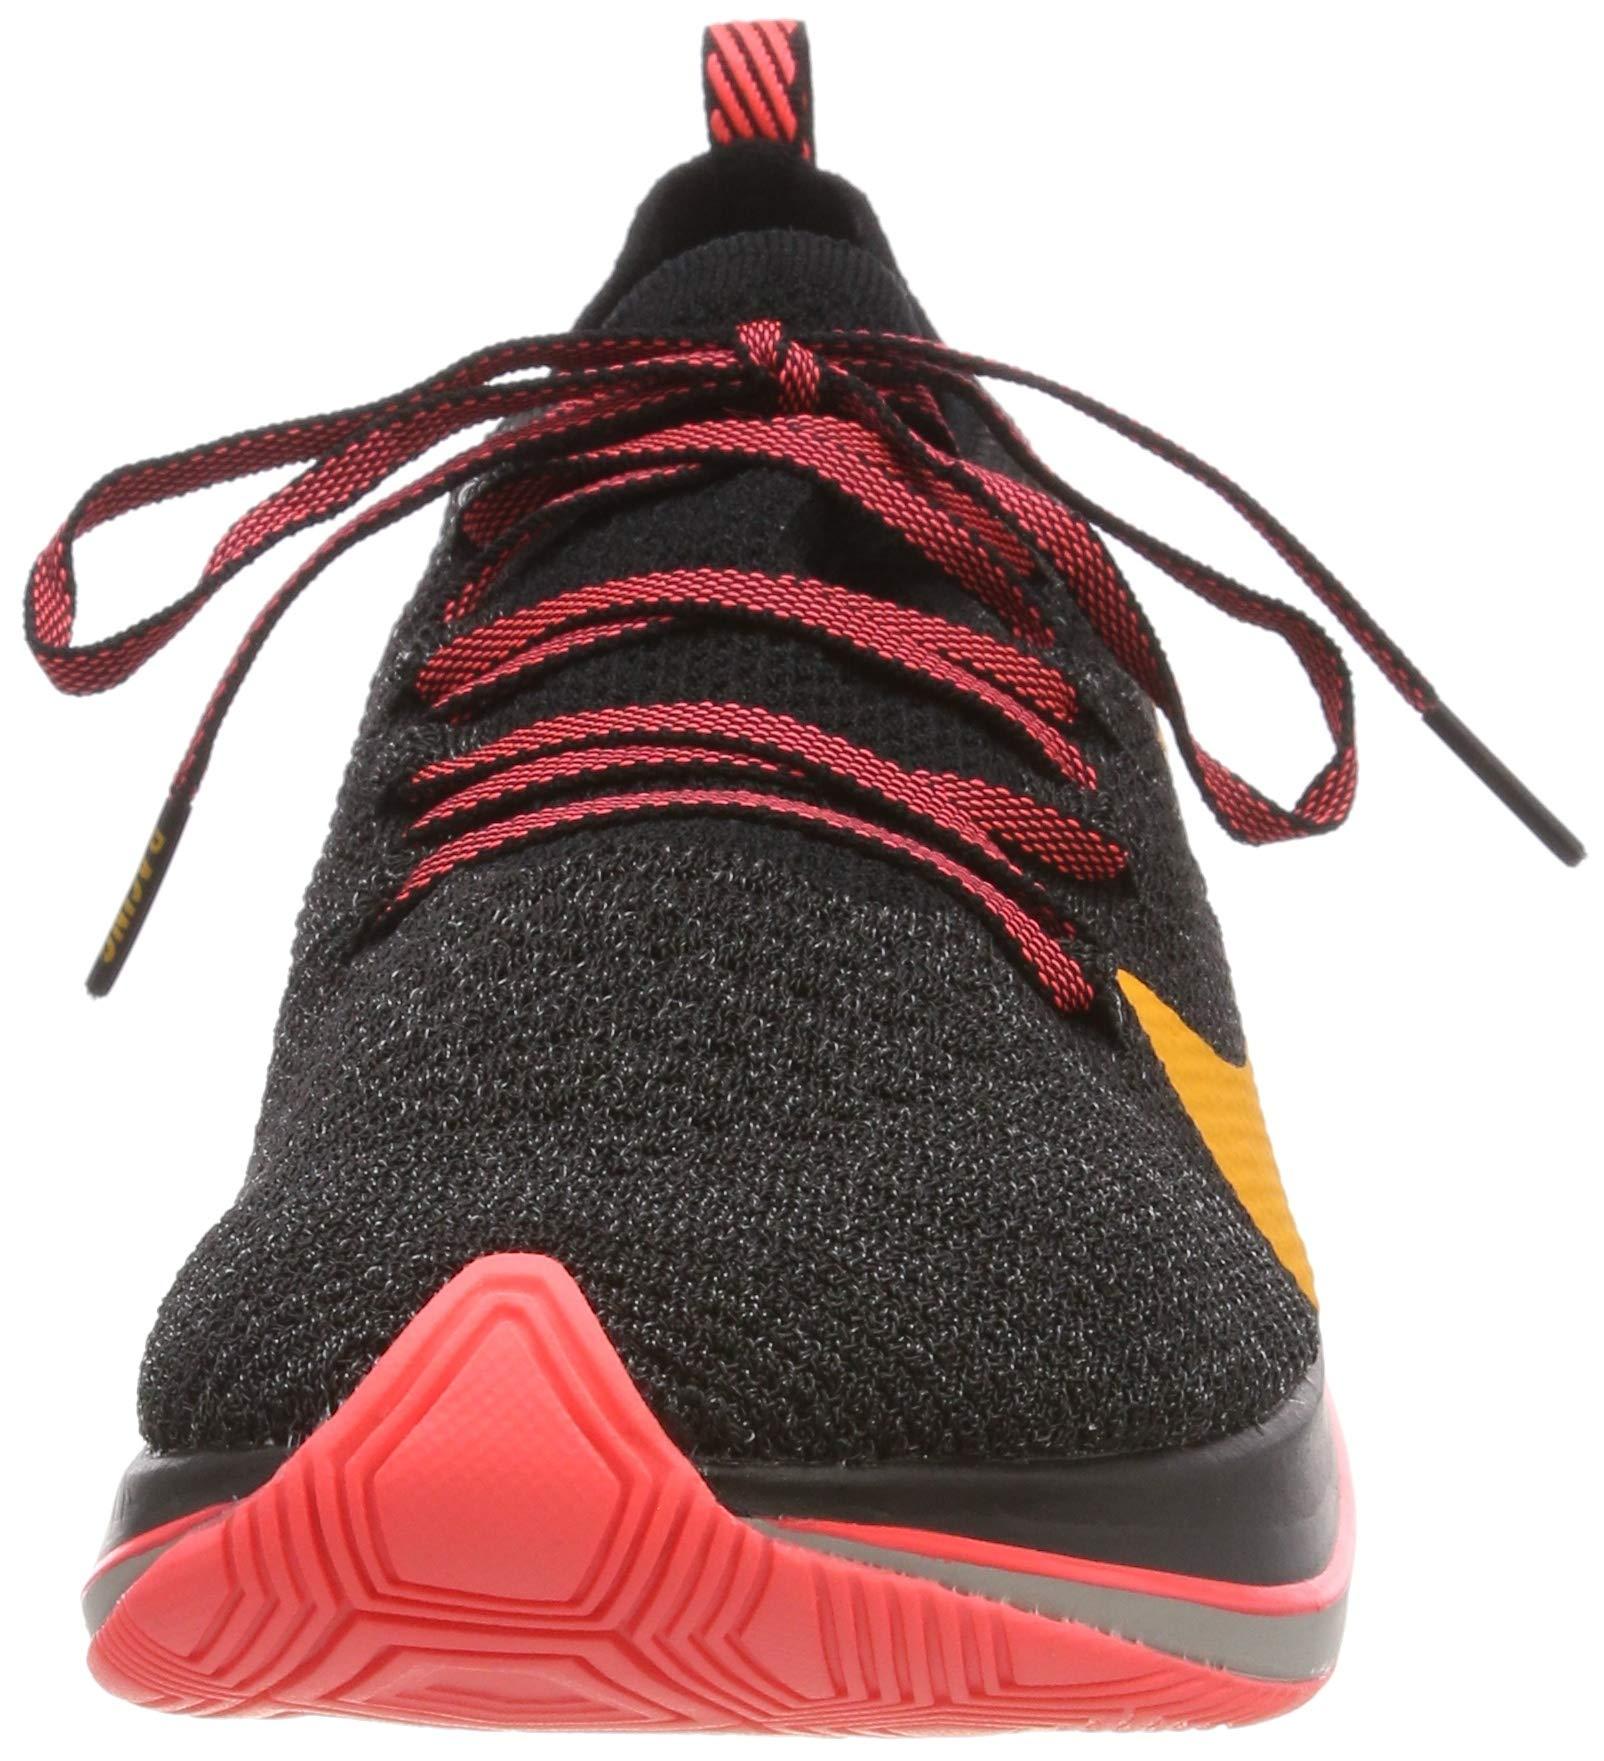 Nike Zoom Fly Flyknit Men's Running Shoe Black/Orange Peel-Flash Crimson Size 8 M US by Nike (Image #4)